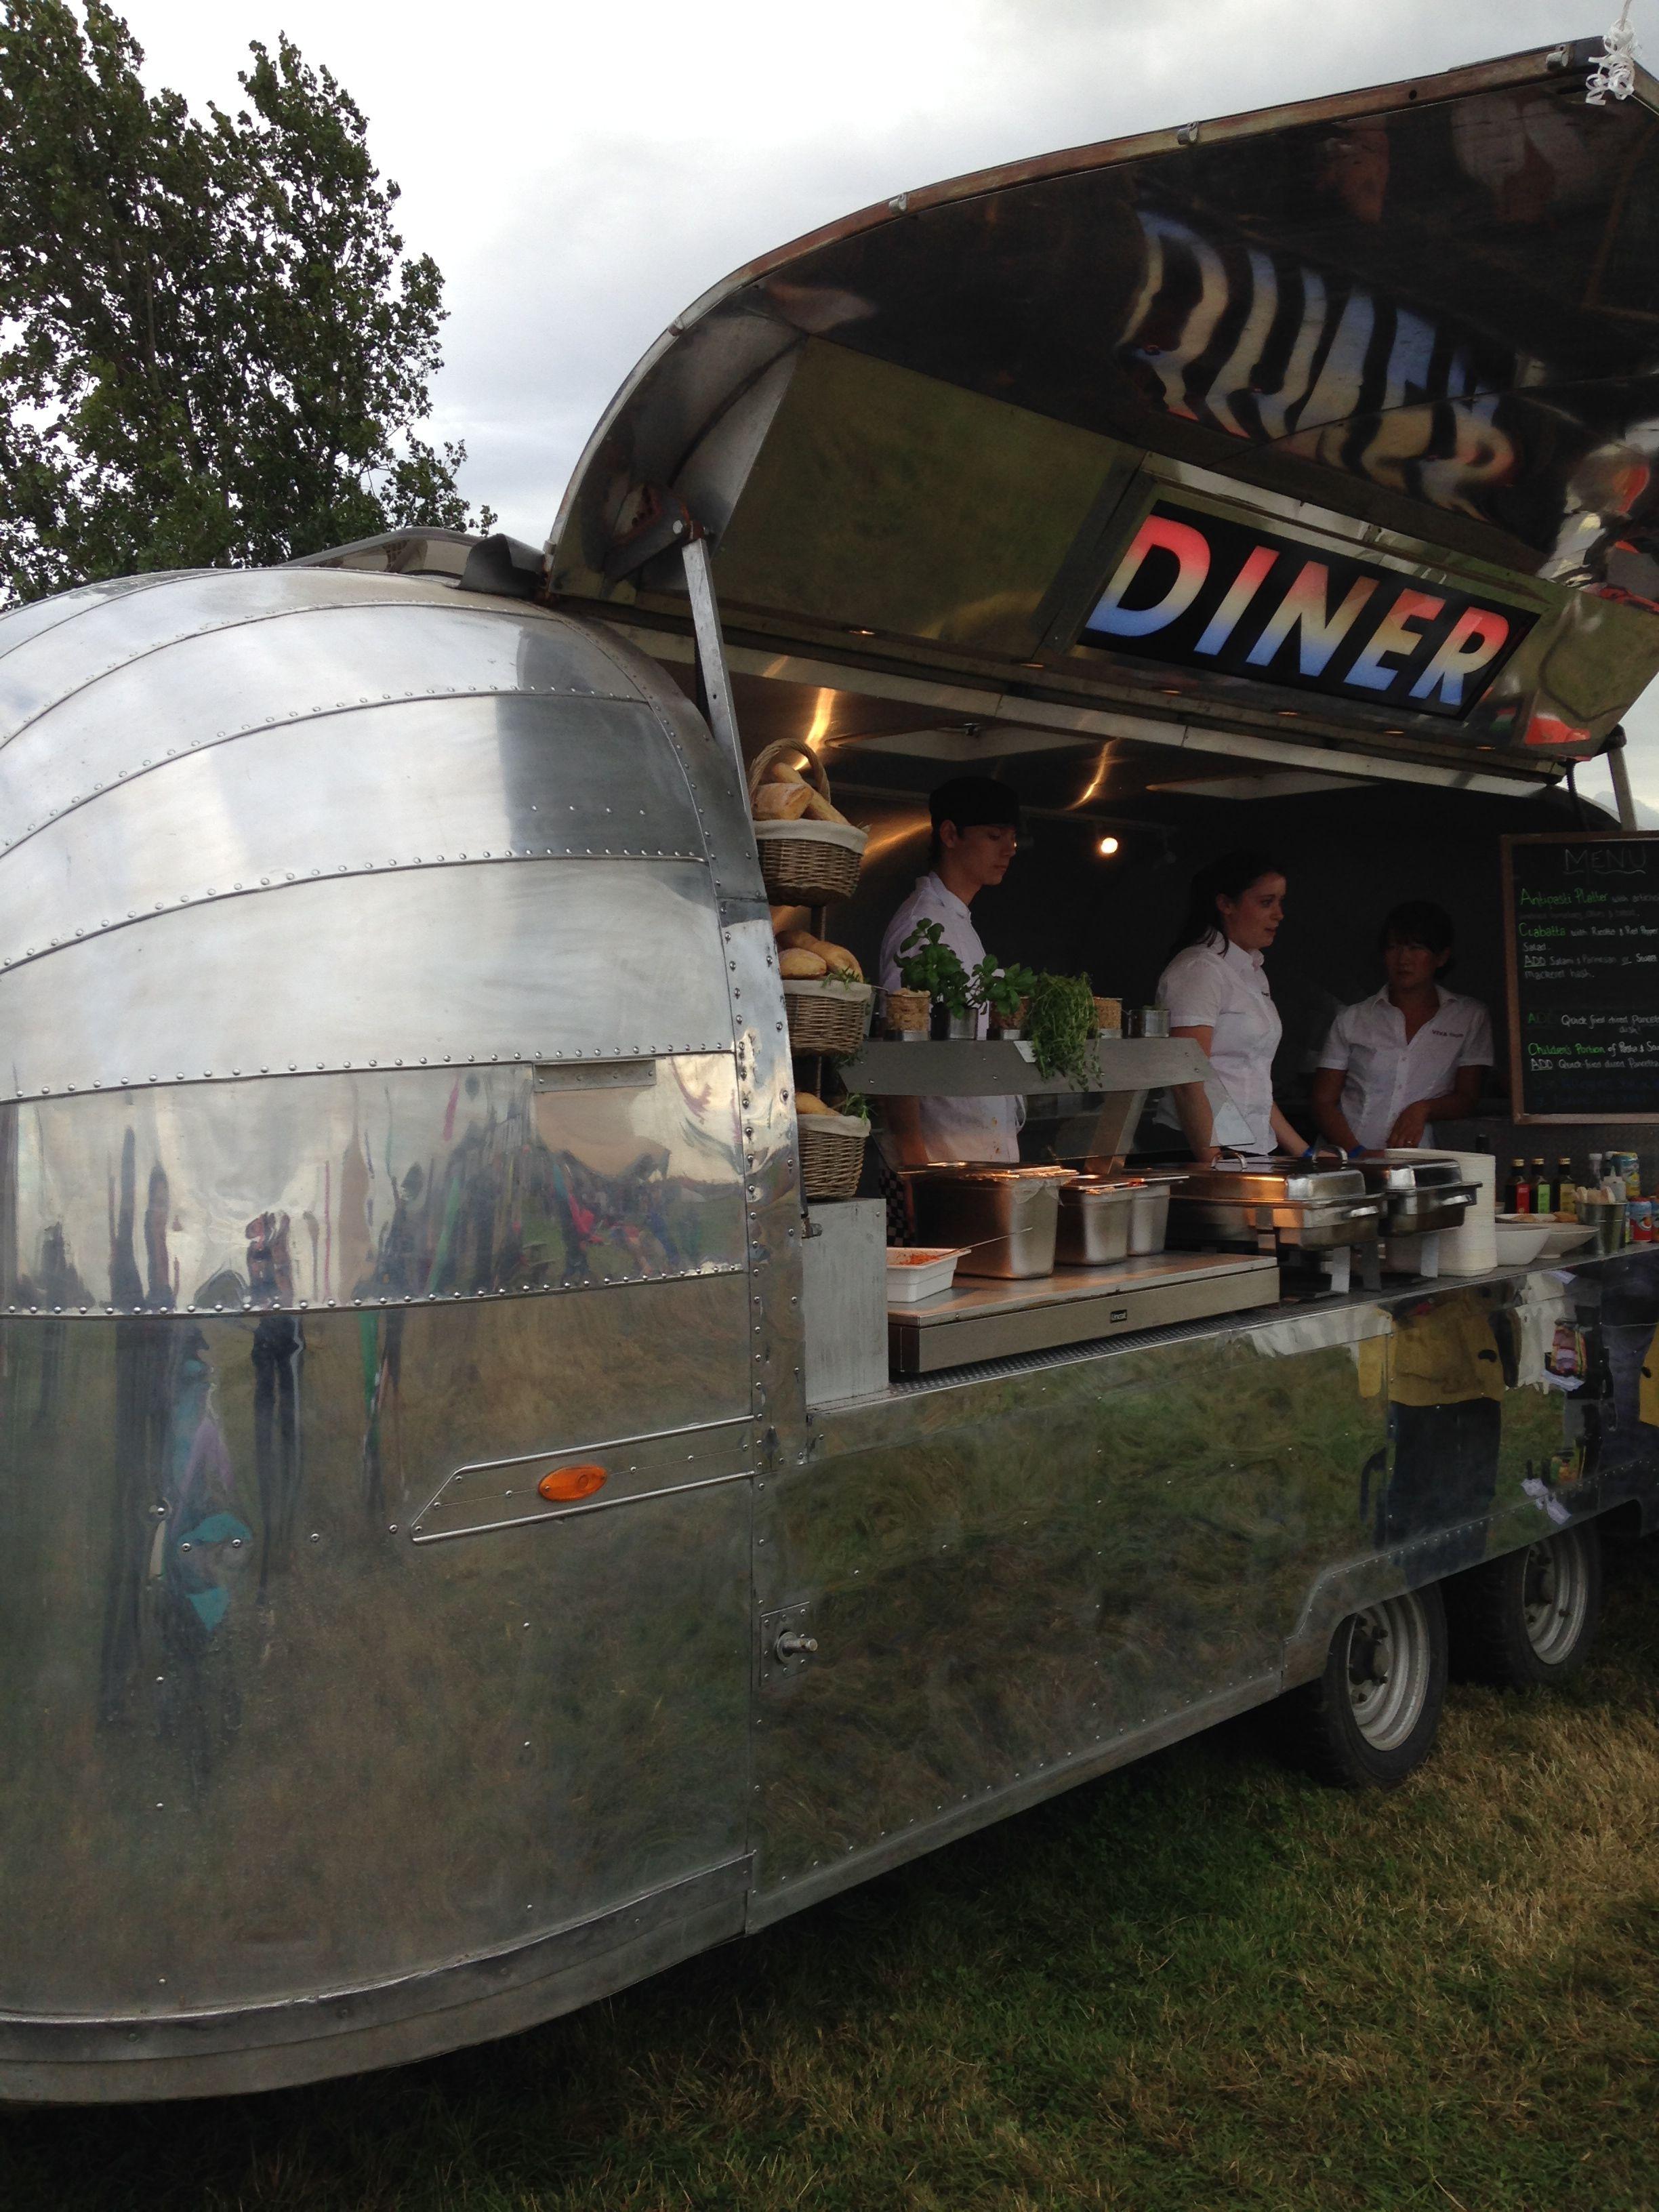 jamie oliver 39 s airstream food truck food trucks pinterest caravane bar et citation. Black Bedroom Furniture Sets. Home Design Ideas